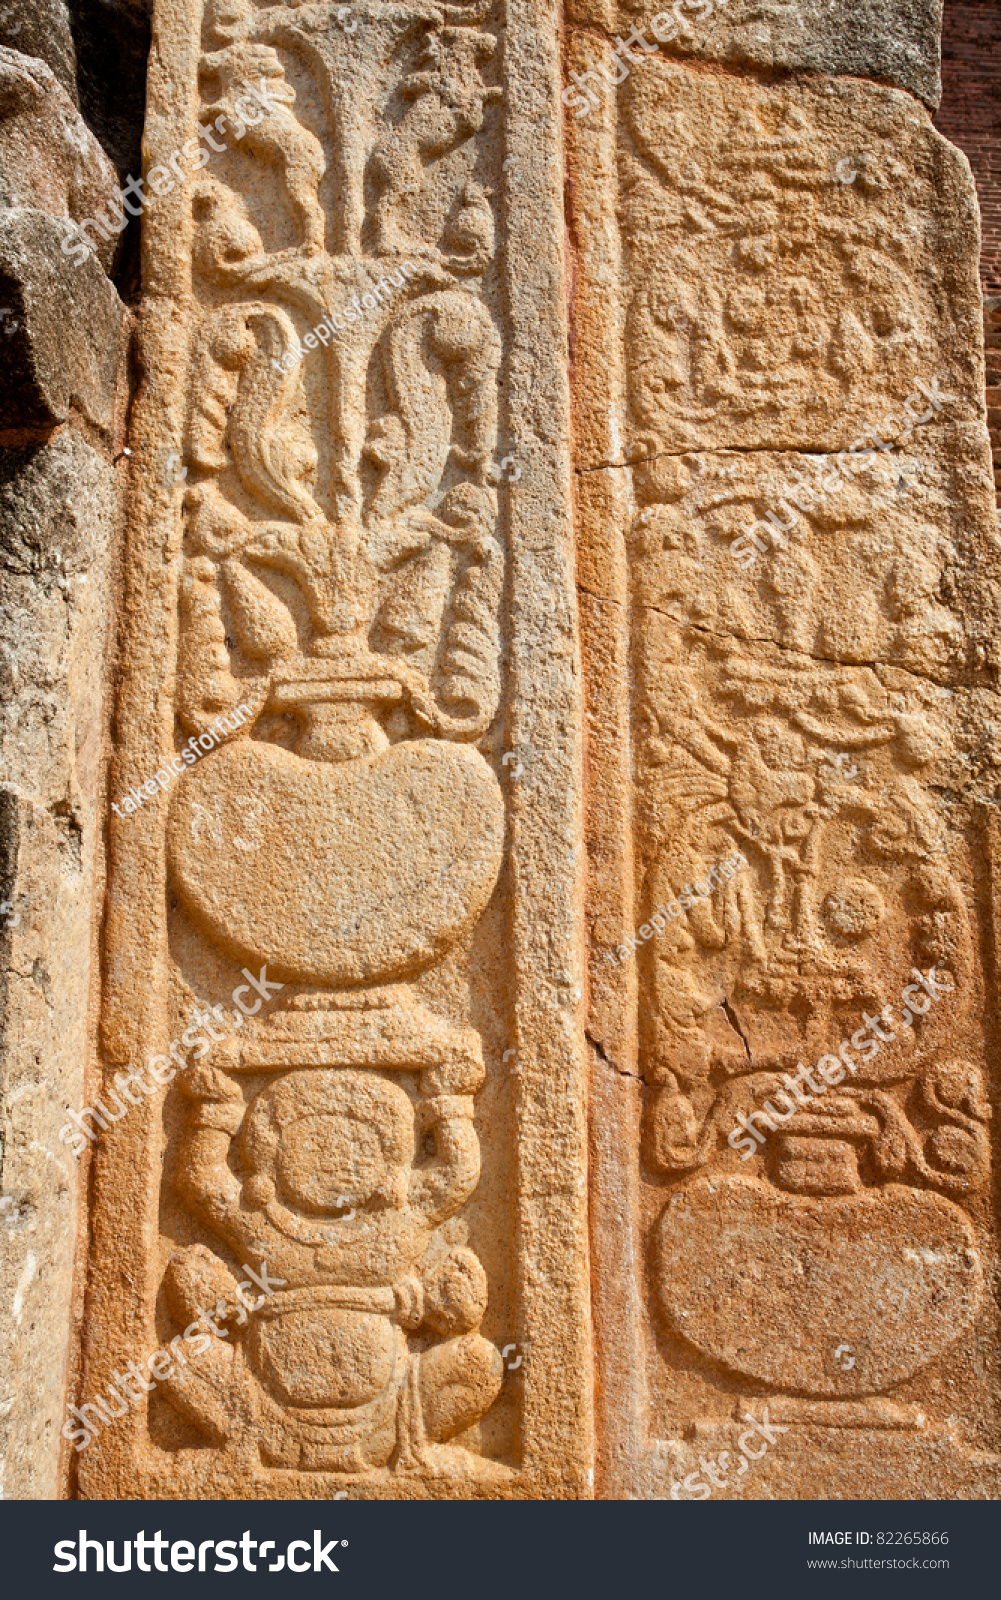 Ancient stone carvings in jetavana monastery anuradhapura